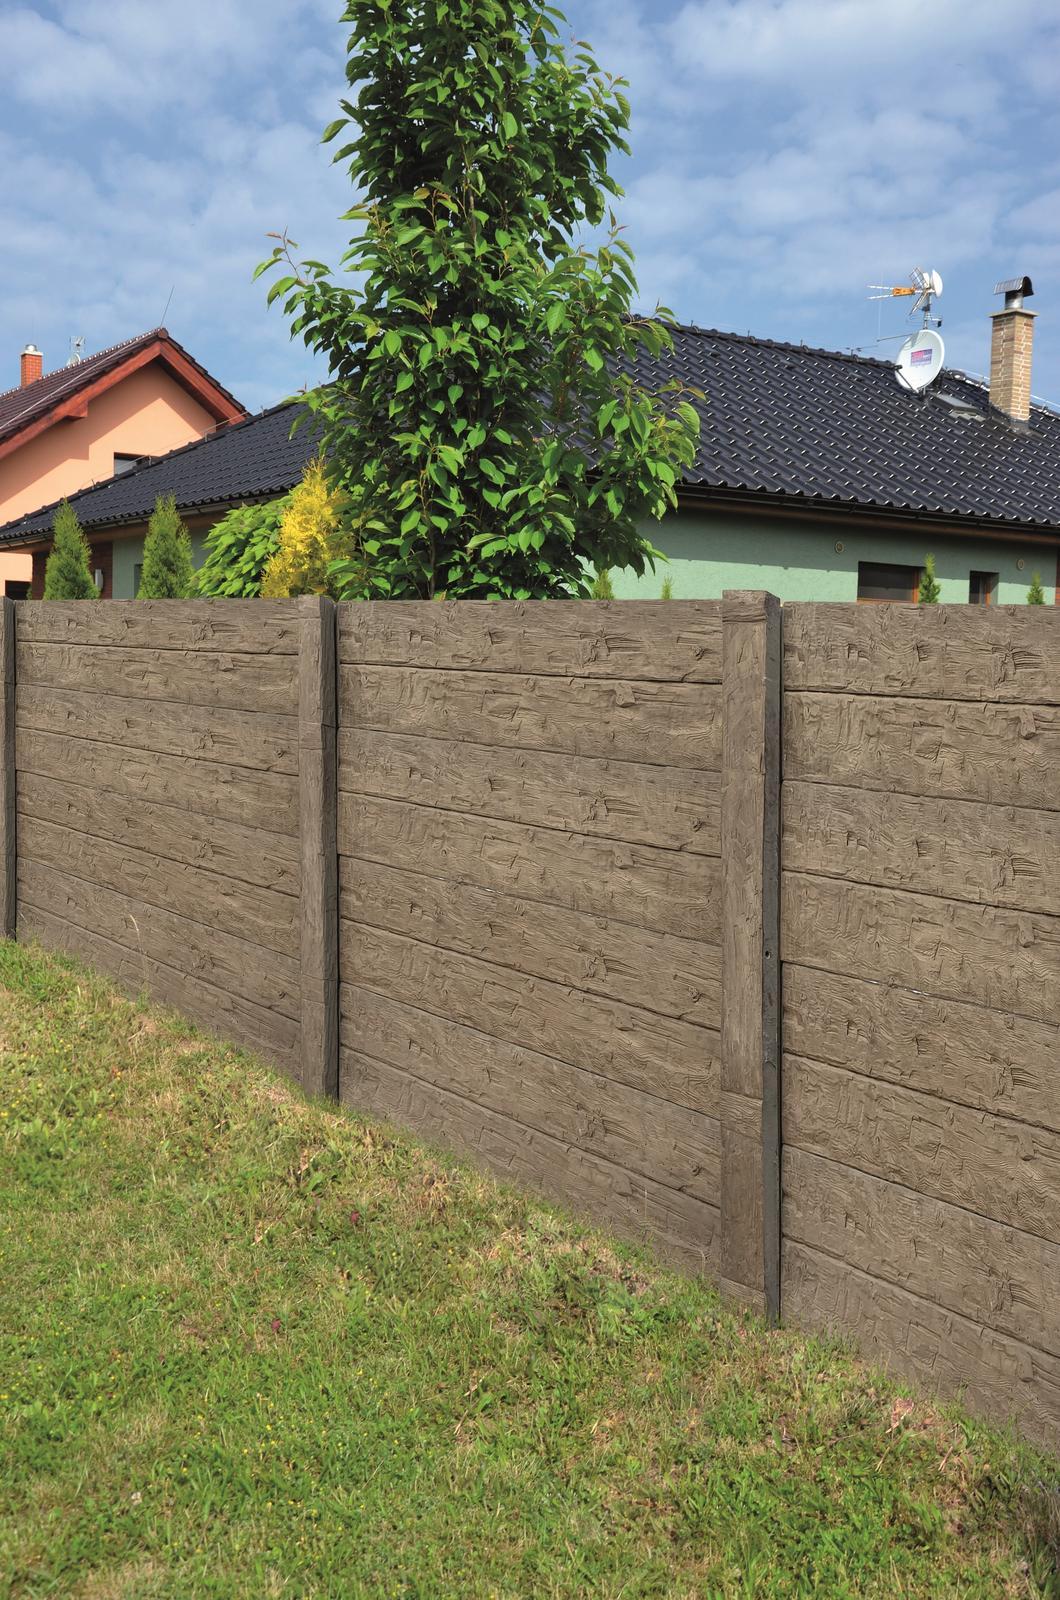 Betonové ploty z tvárnic, cihel a deskové - Plotový systém deskový - reliéf dřevo